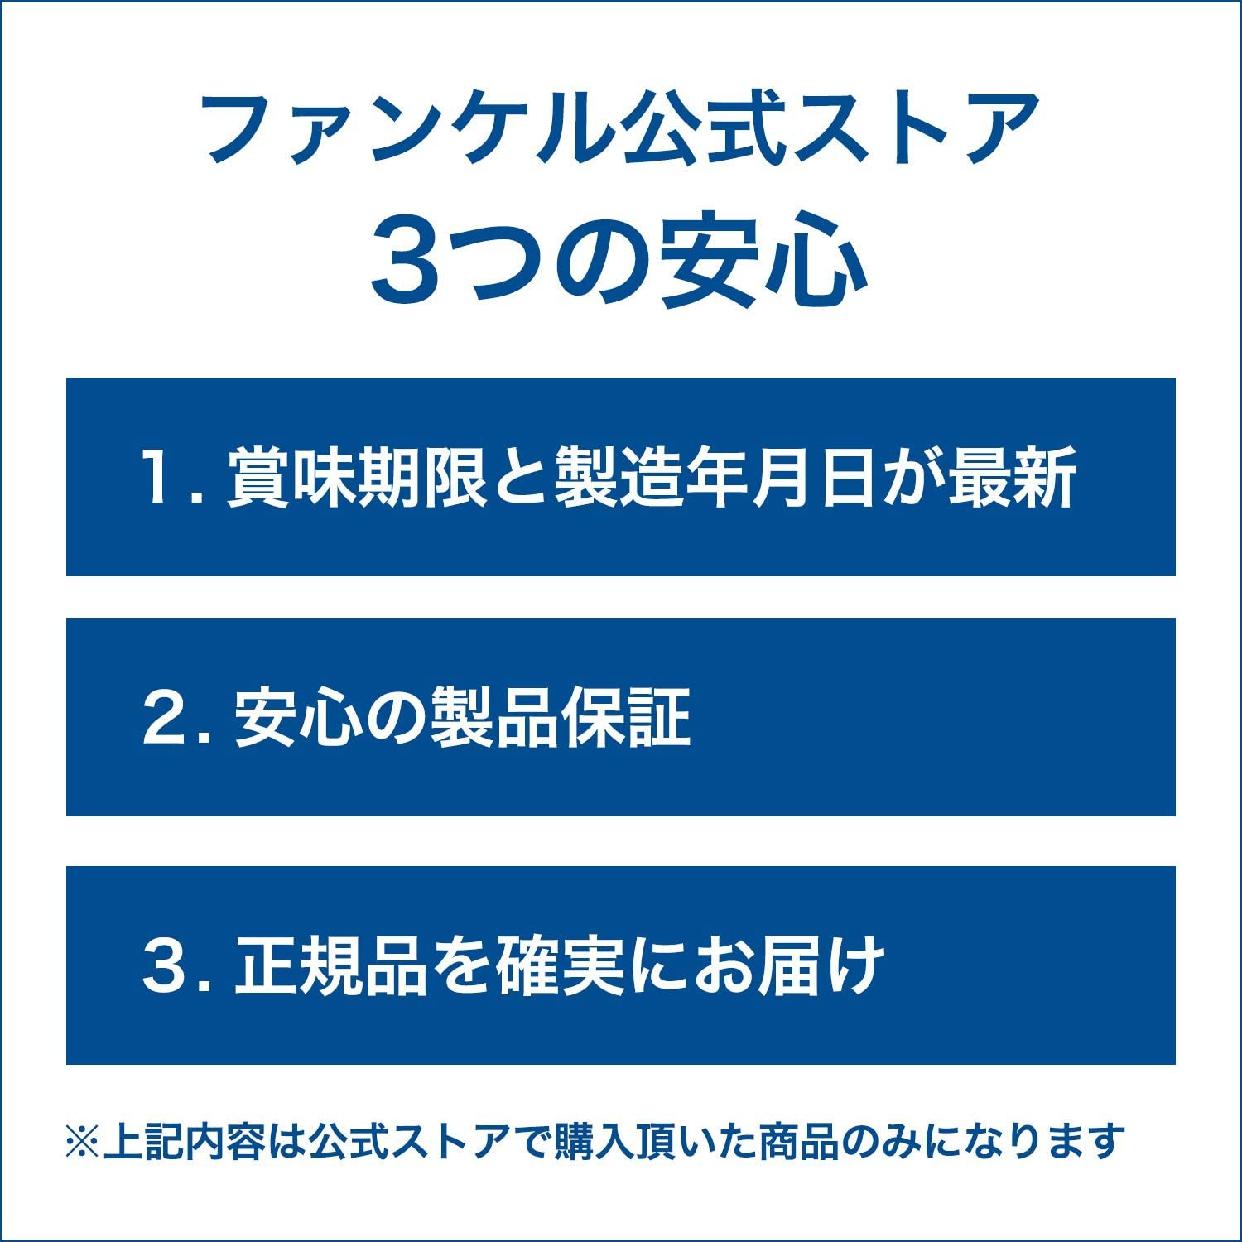 FANCL(ファンケル)新ホワイトニング 化粧液Ⅱ しっとりの商品画像2